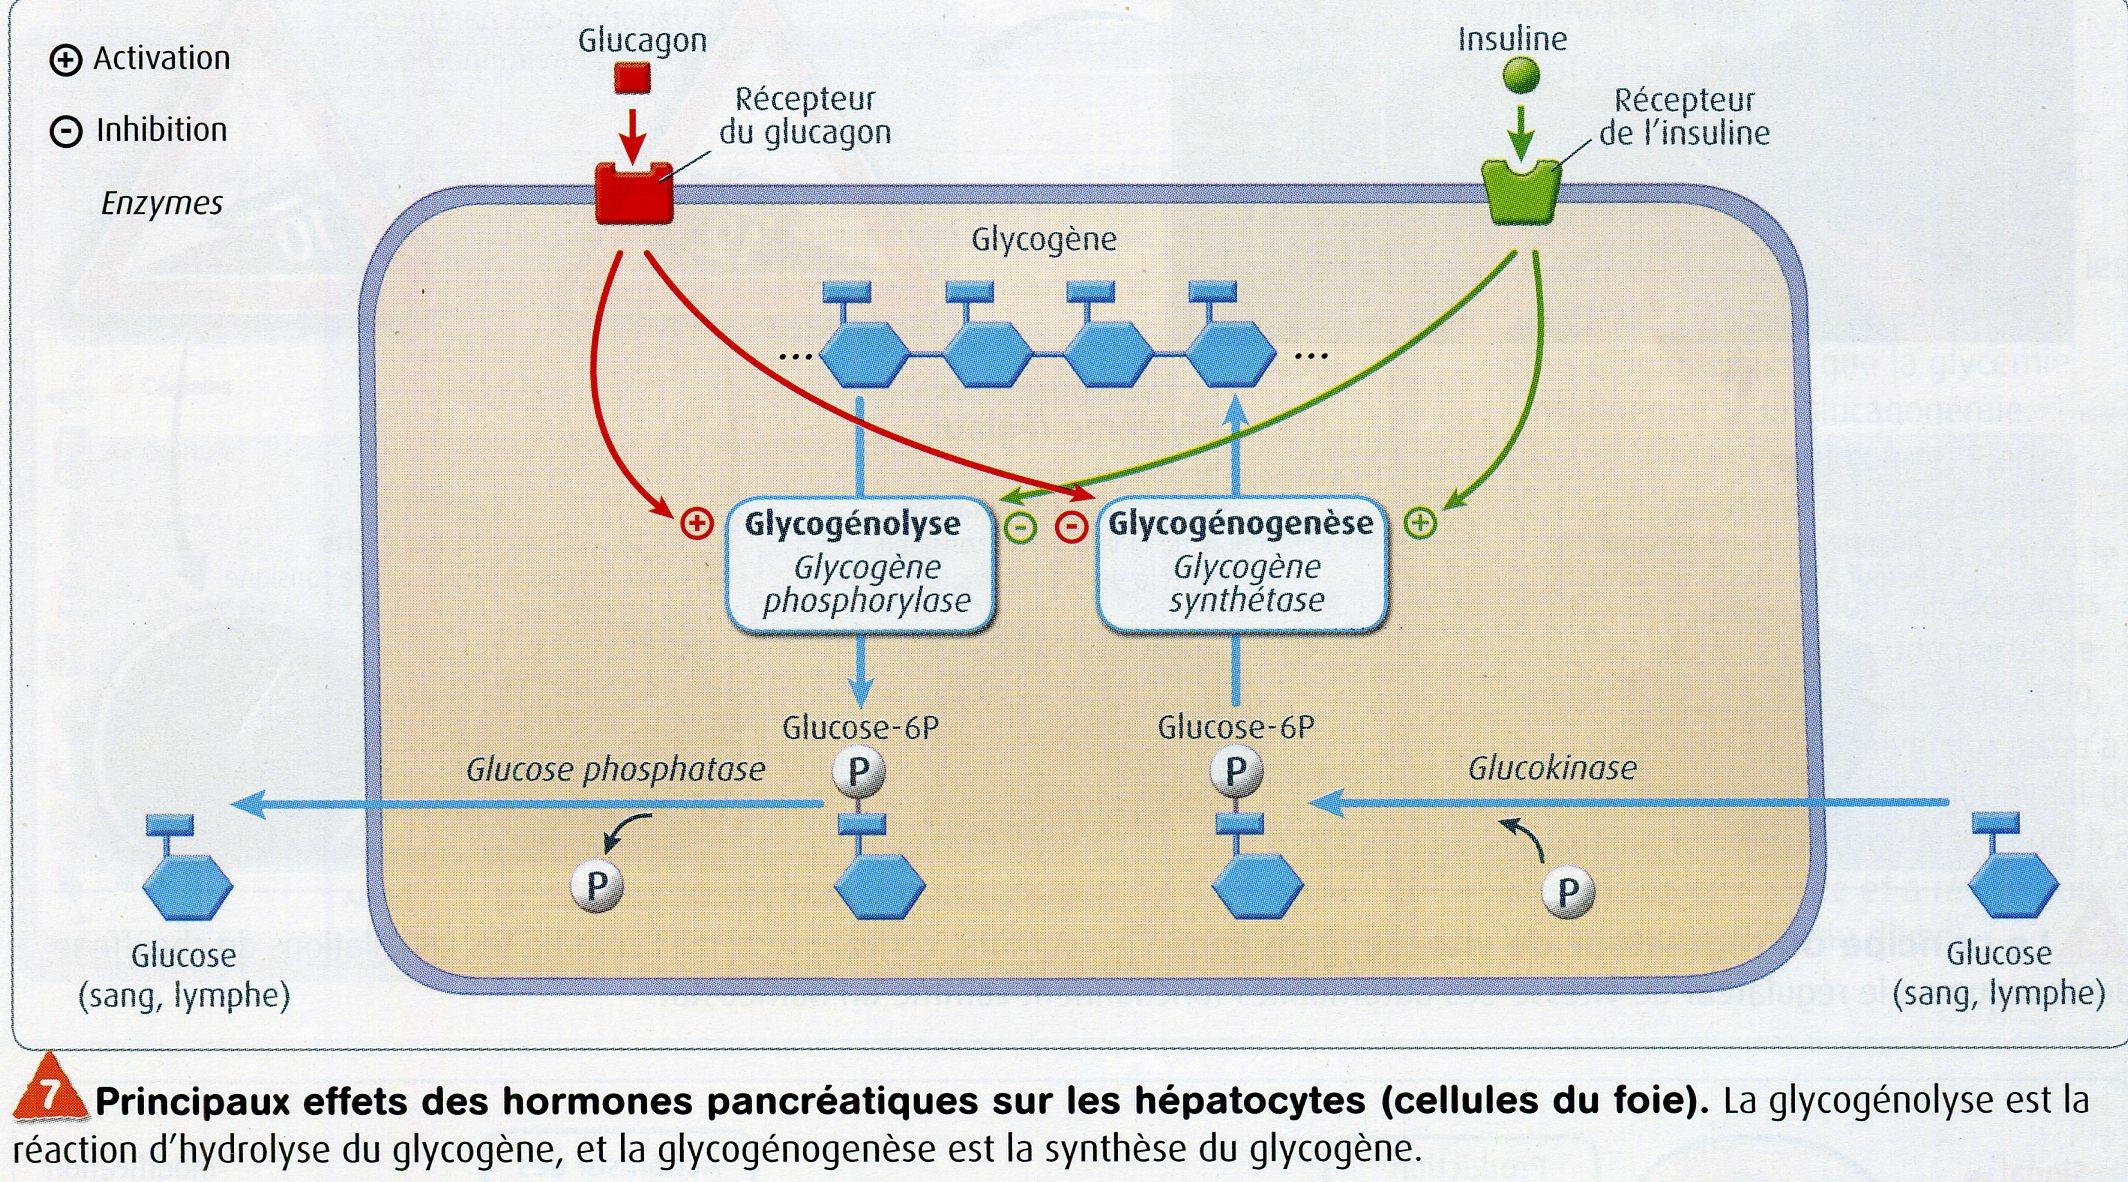 Effet insuline glucagon